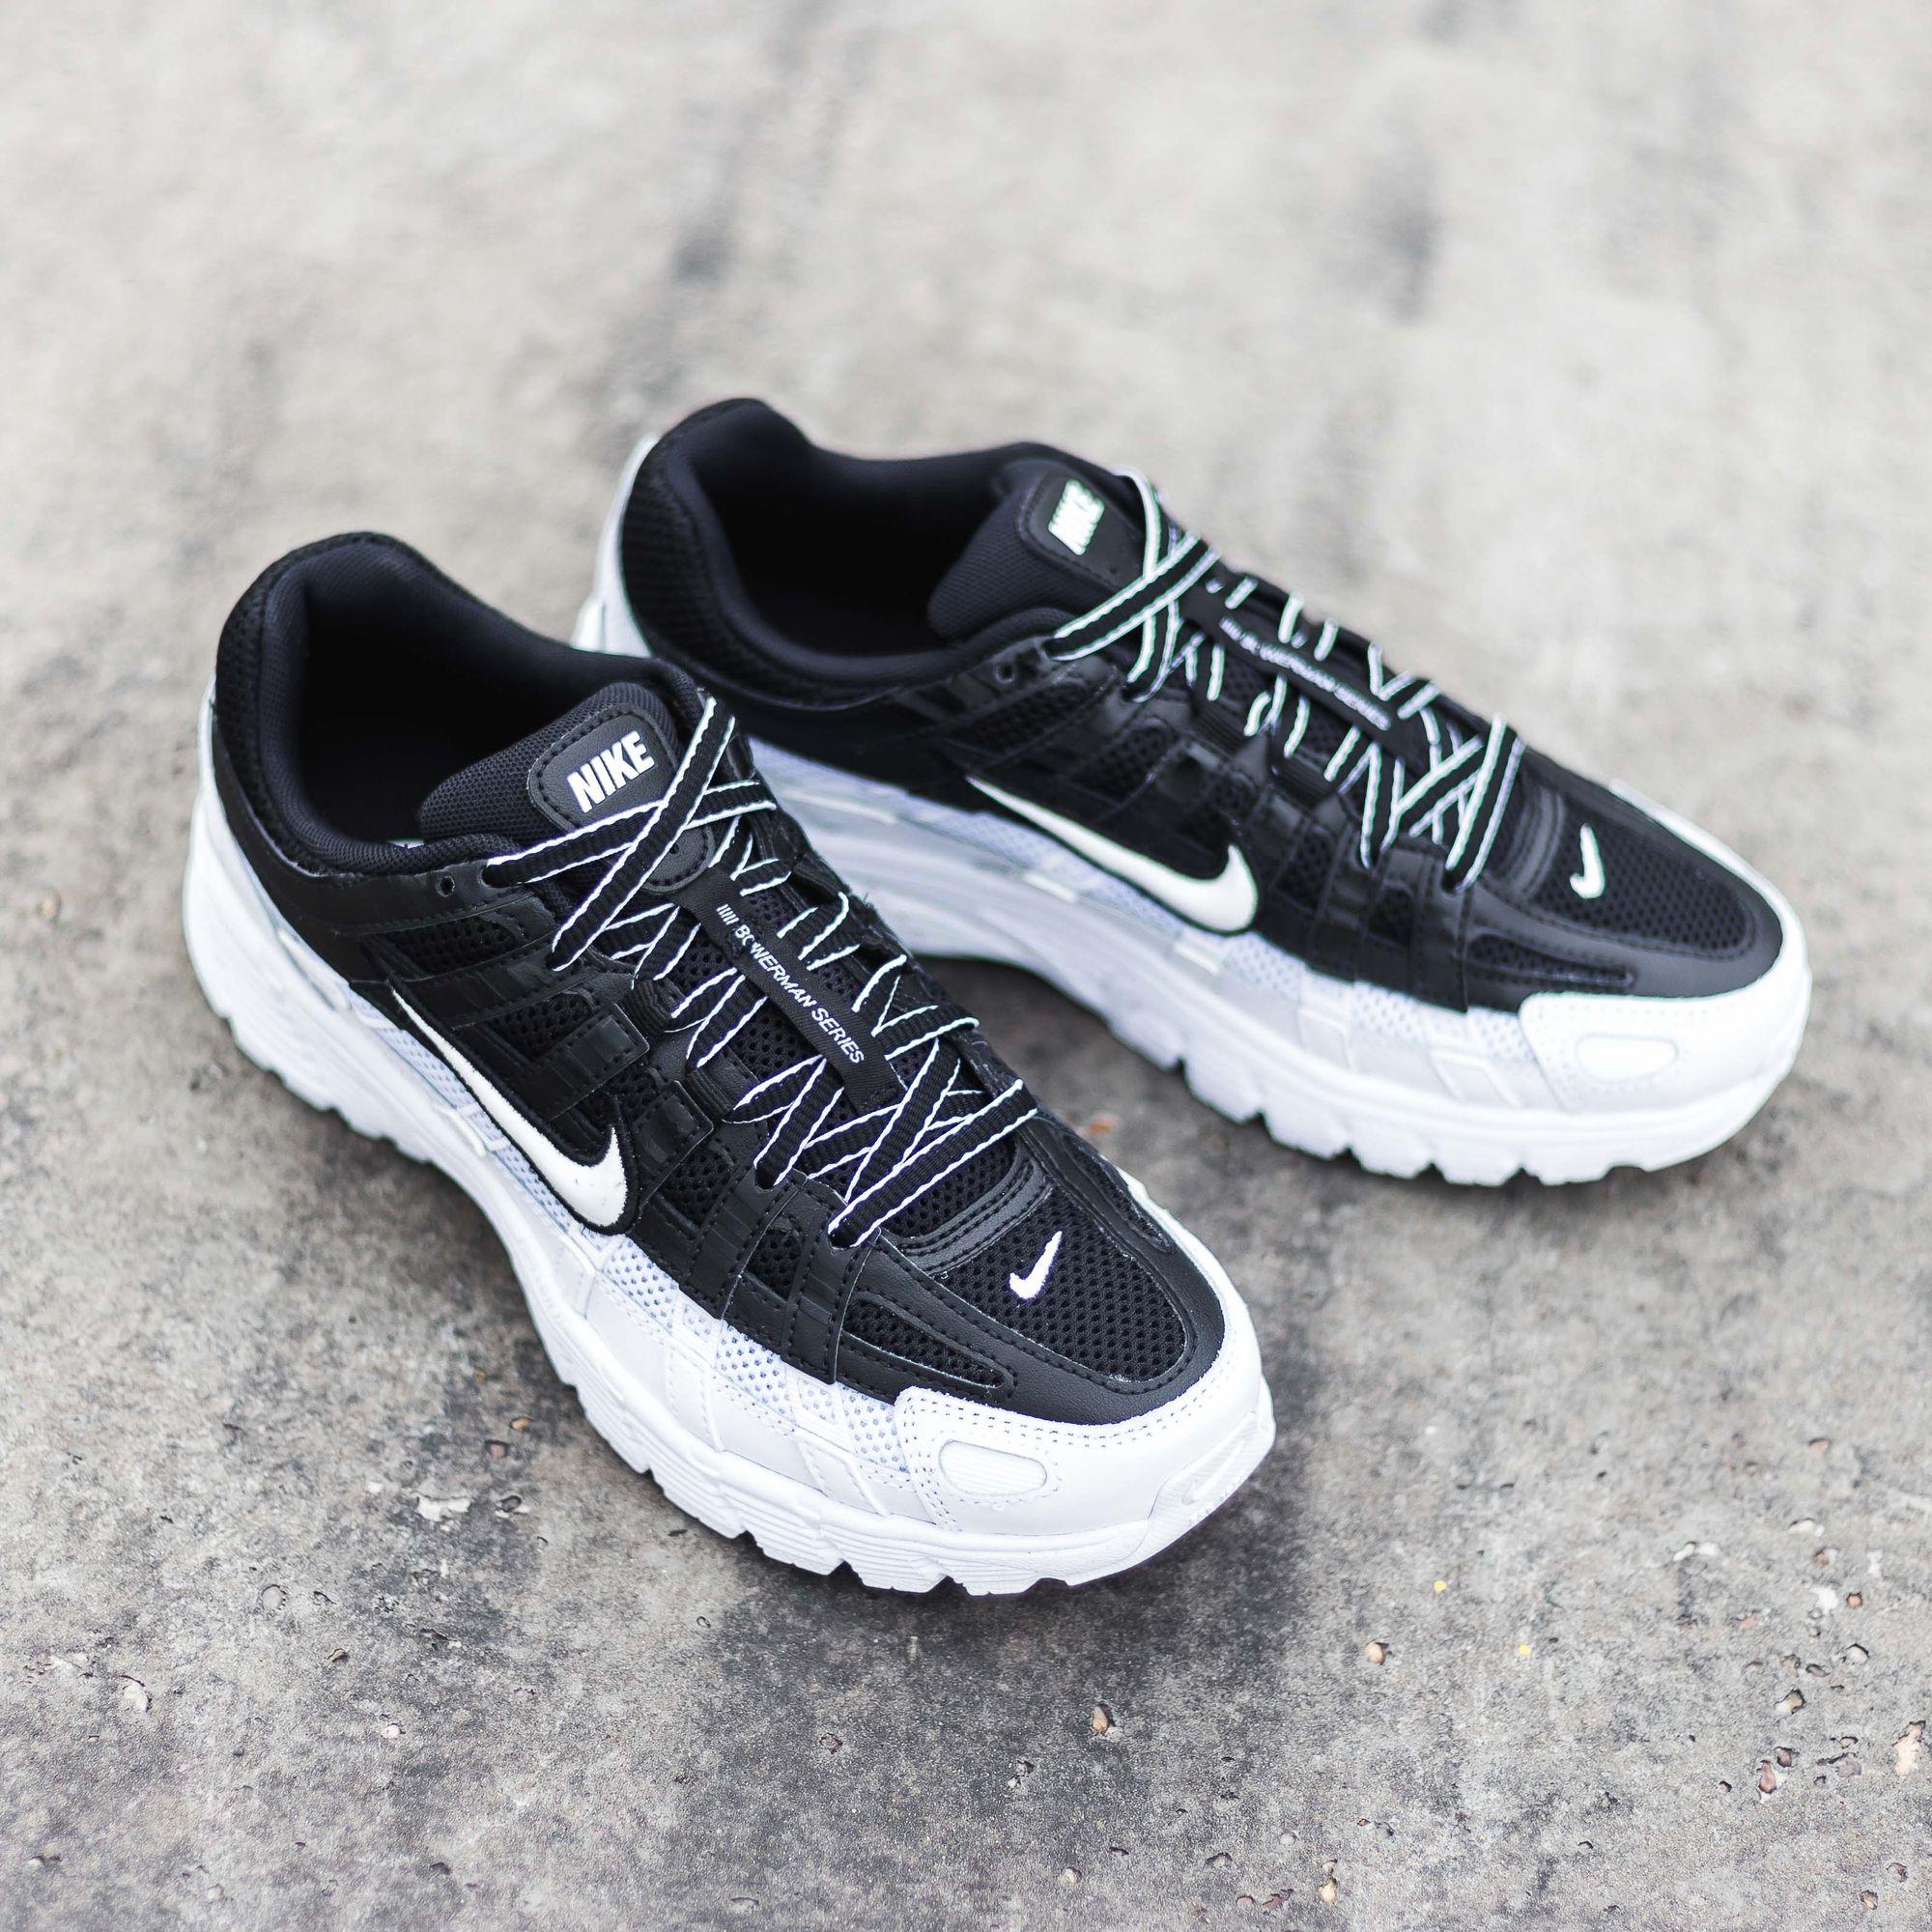 Nike W P 3000 Black And White Afewaddicted Nike P3000 Tech Sneakers